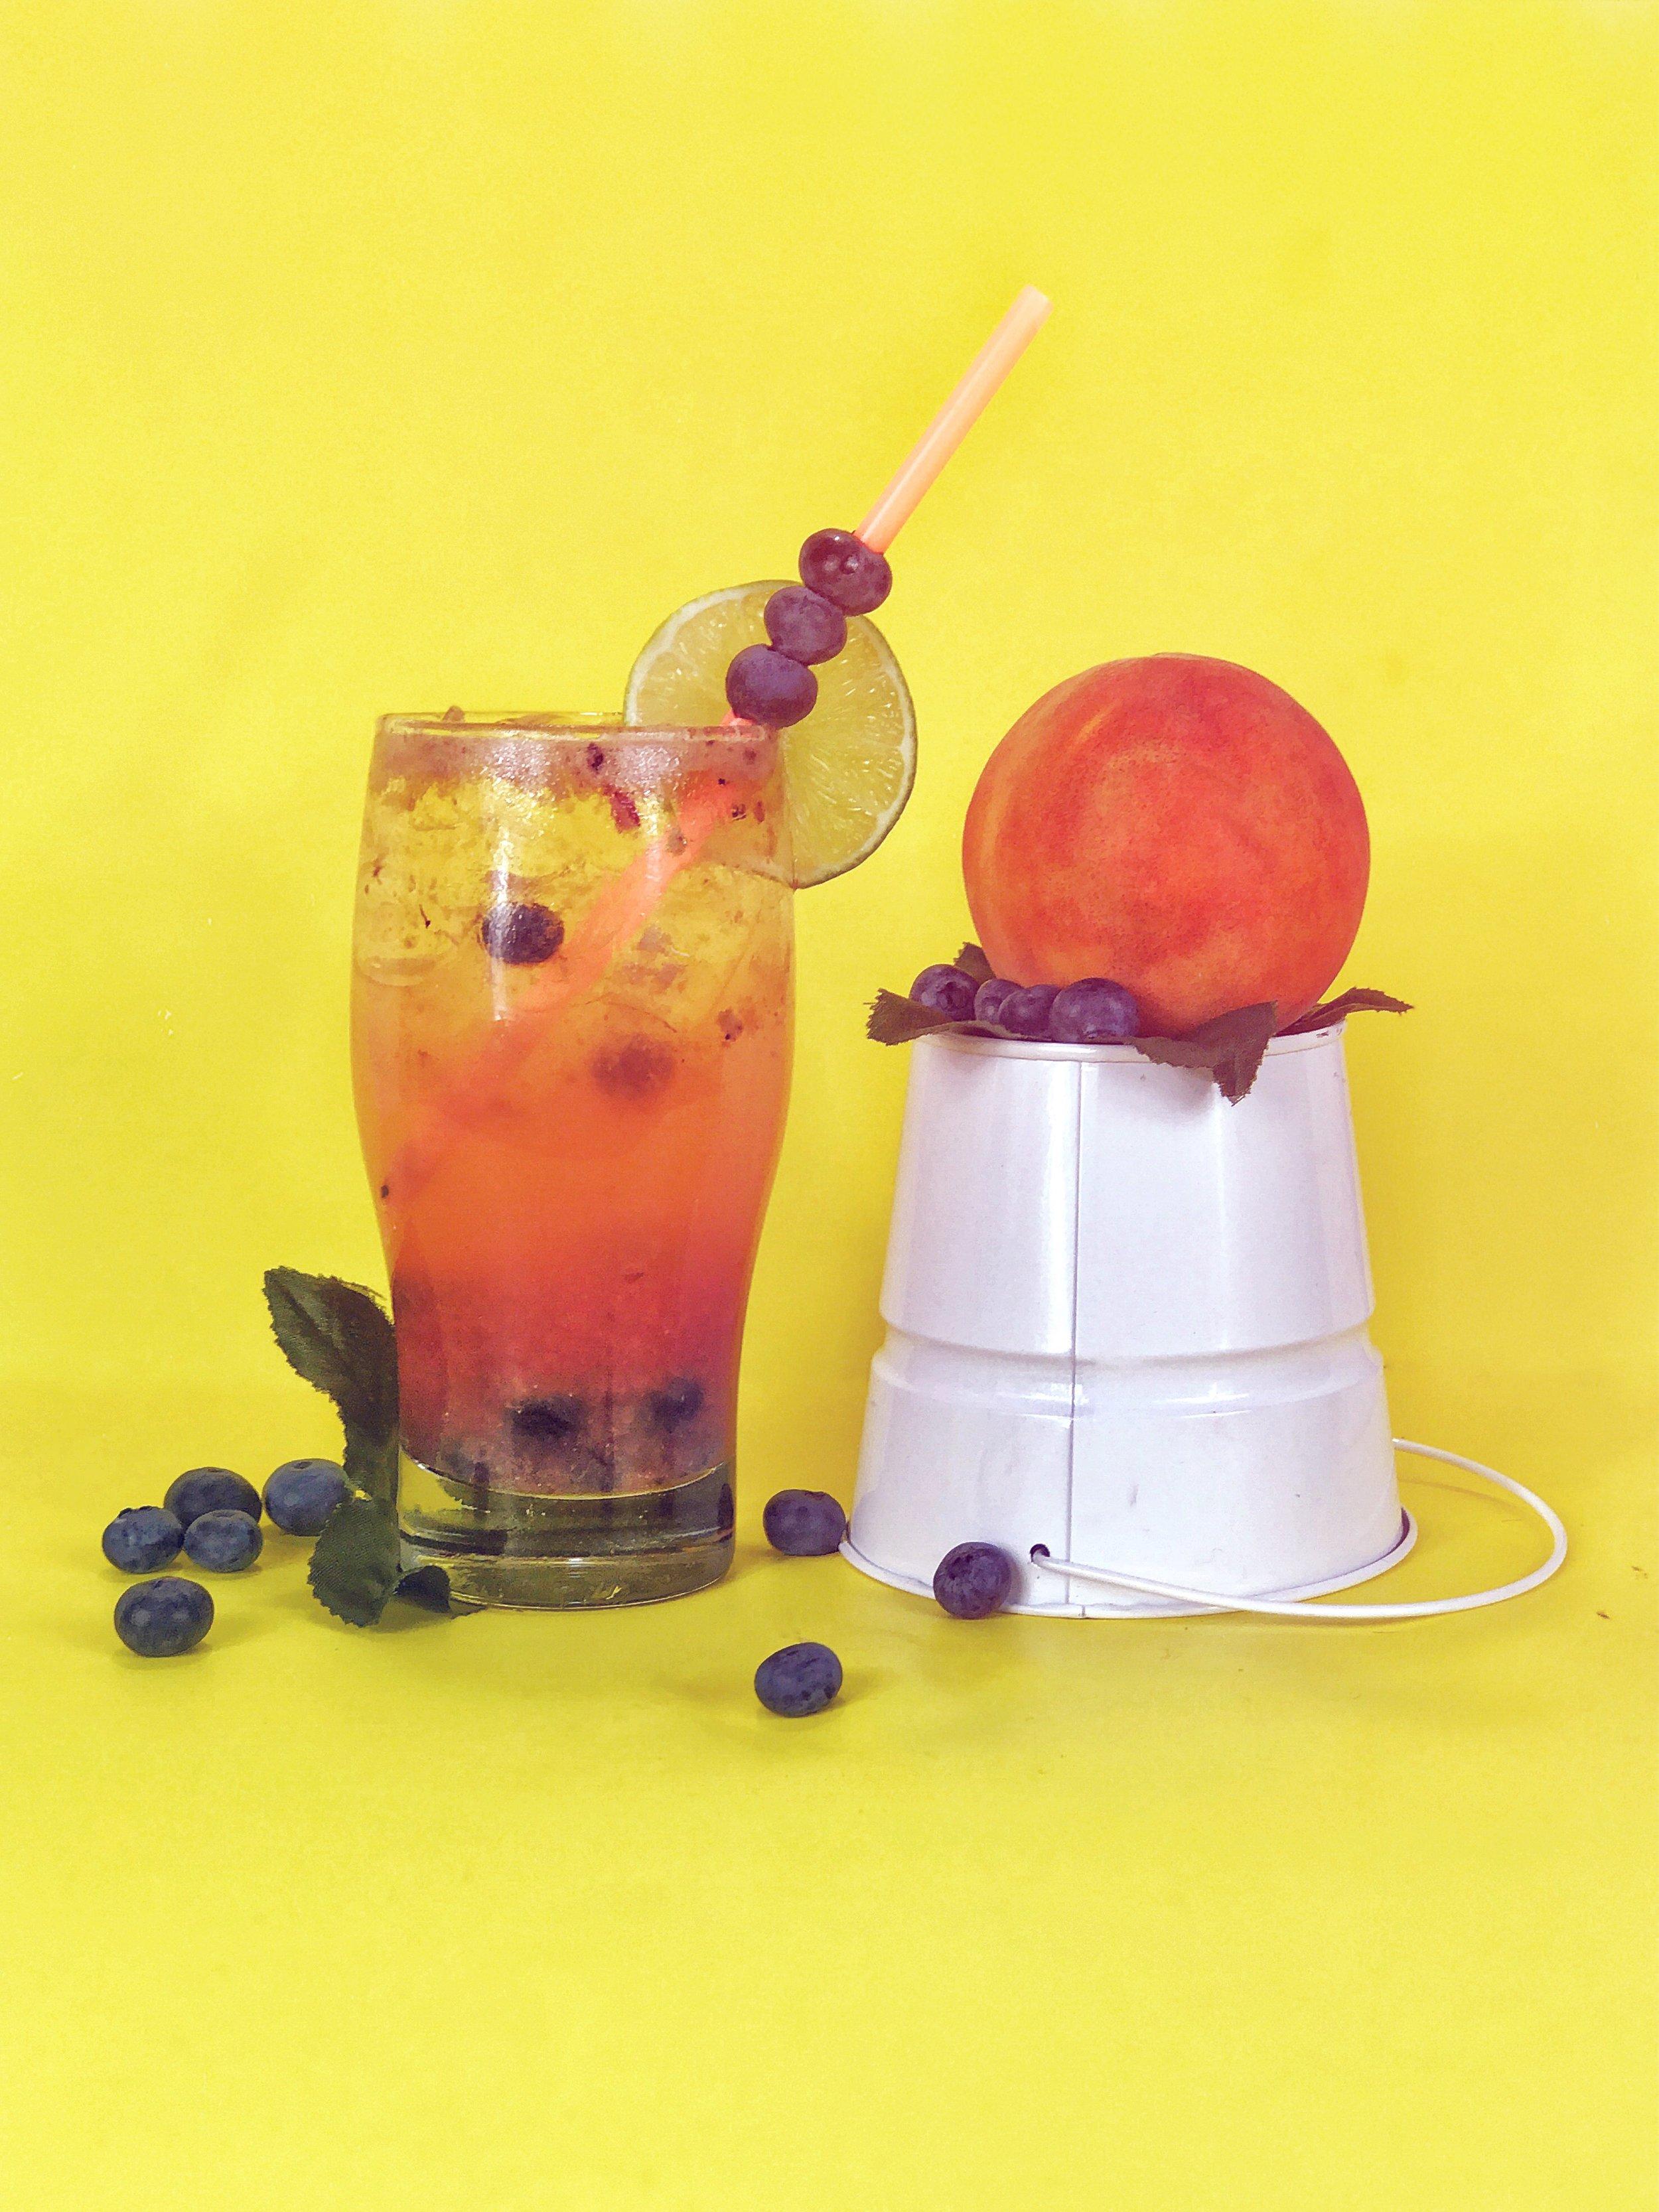 Peach-blueberrybourbon fizz - 1. Muddle blueberry and peach.2. Add bourbon (2oz), lime juice (2oz), egg white (1/2oz), and simple syrup (1/2 oz). 3. Shake hard w/ ice. 4. Top with soda. 5. Garnish w/ cherry (if ya like!).